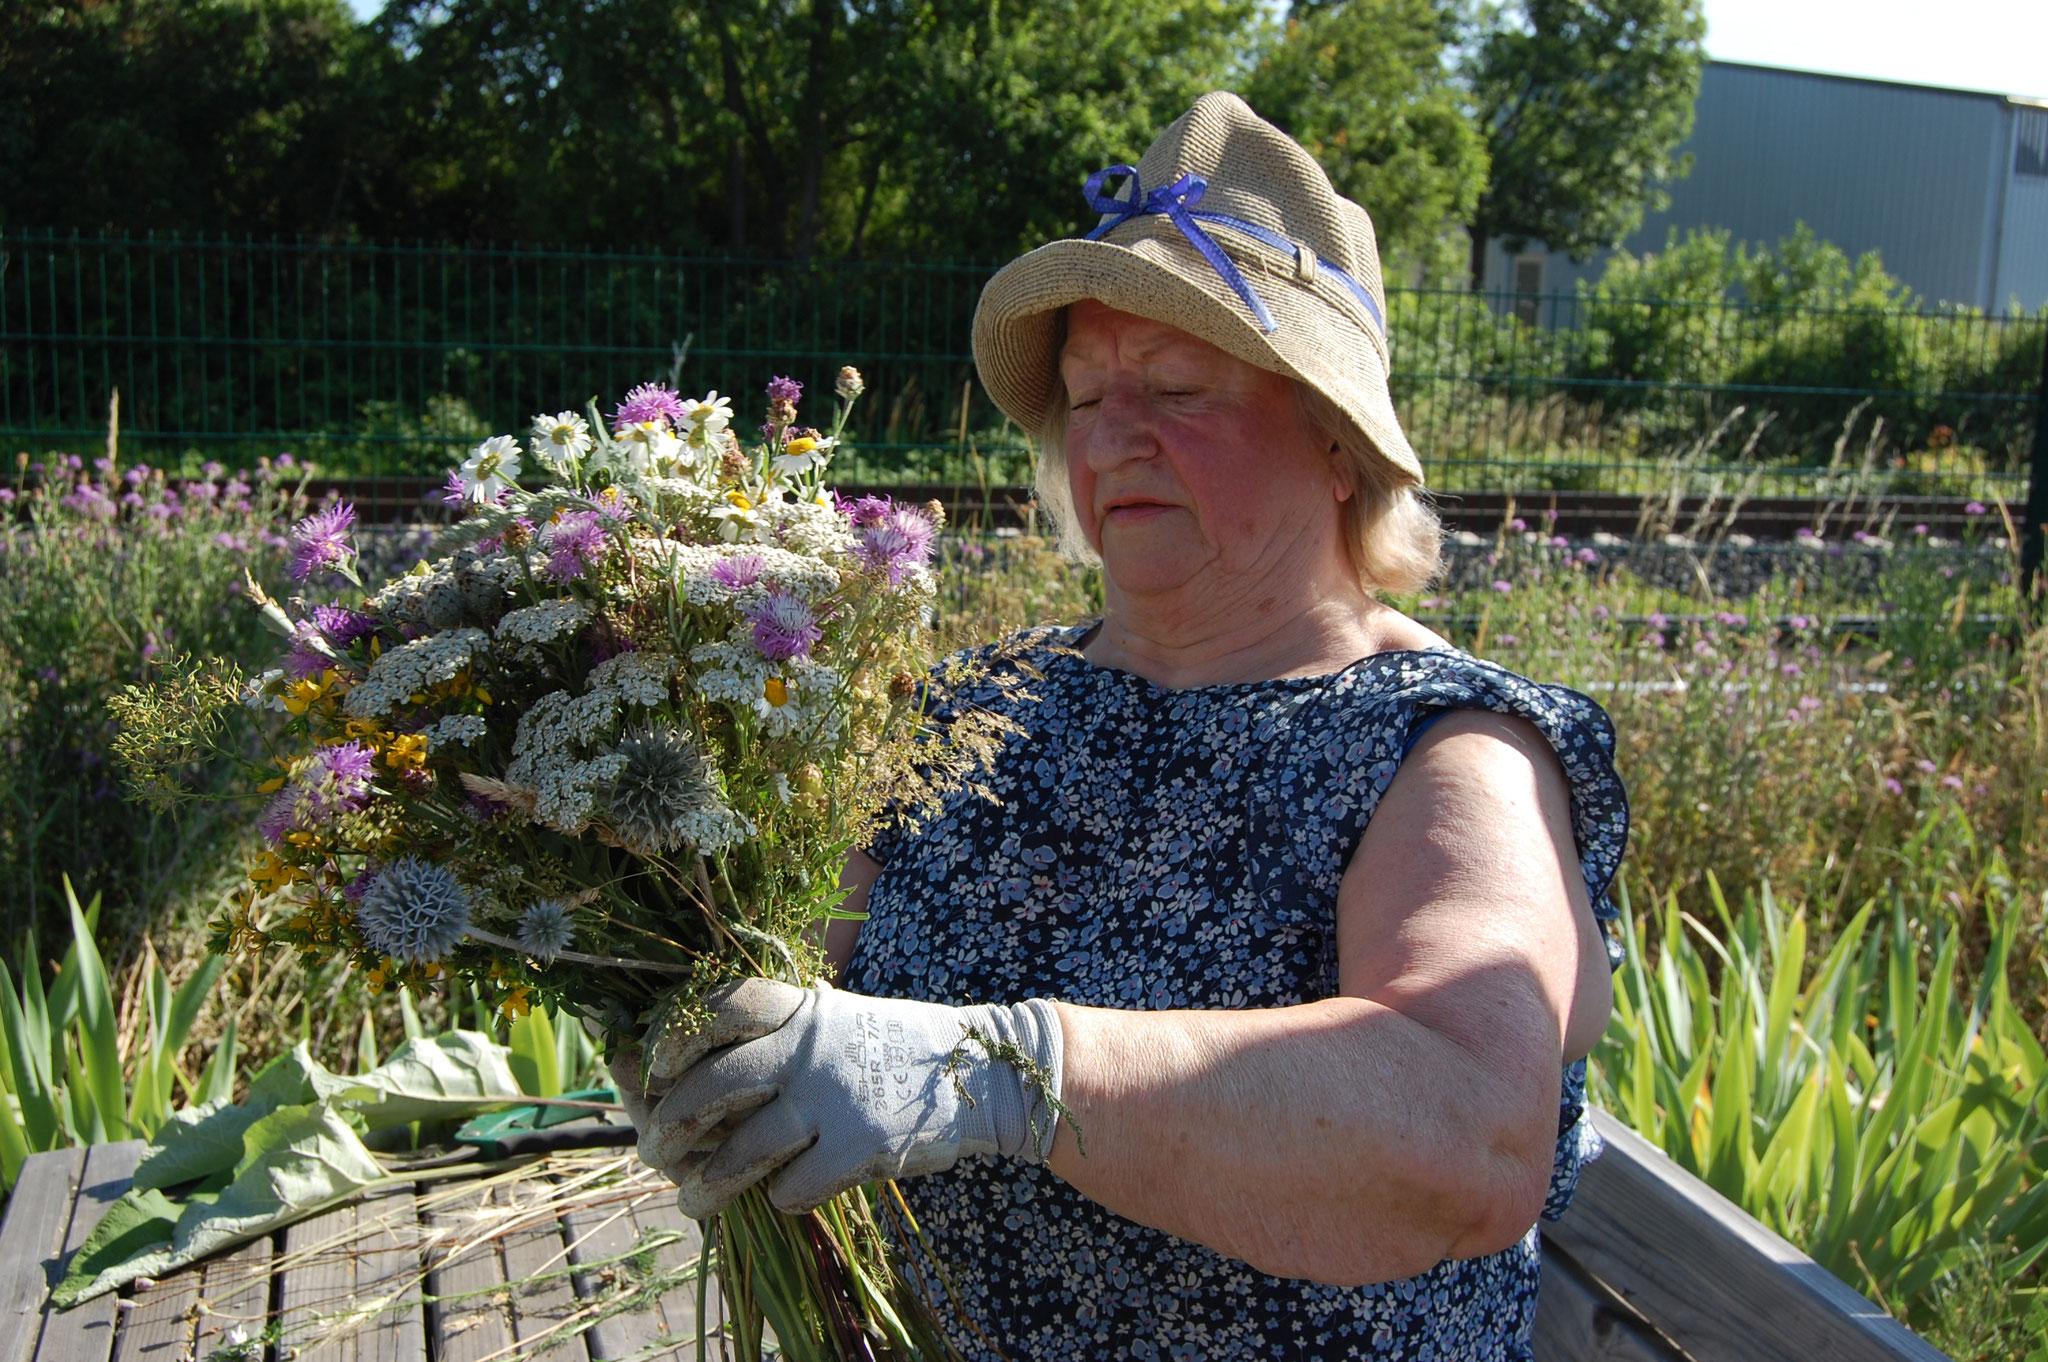 Naturfreundin Angelika Avenarius bindet Wildblumenstrauß, 2020